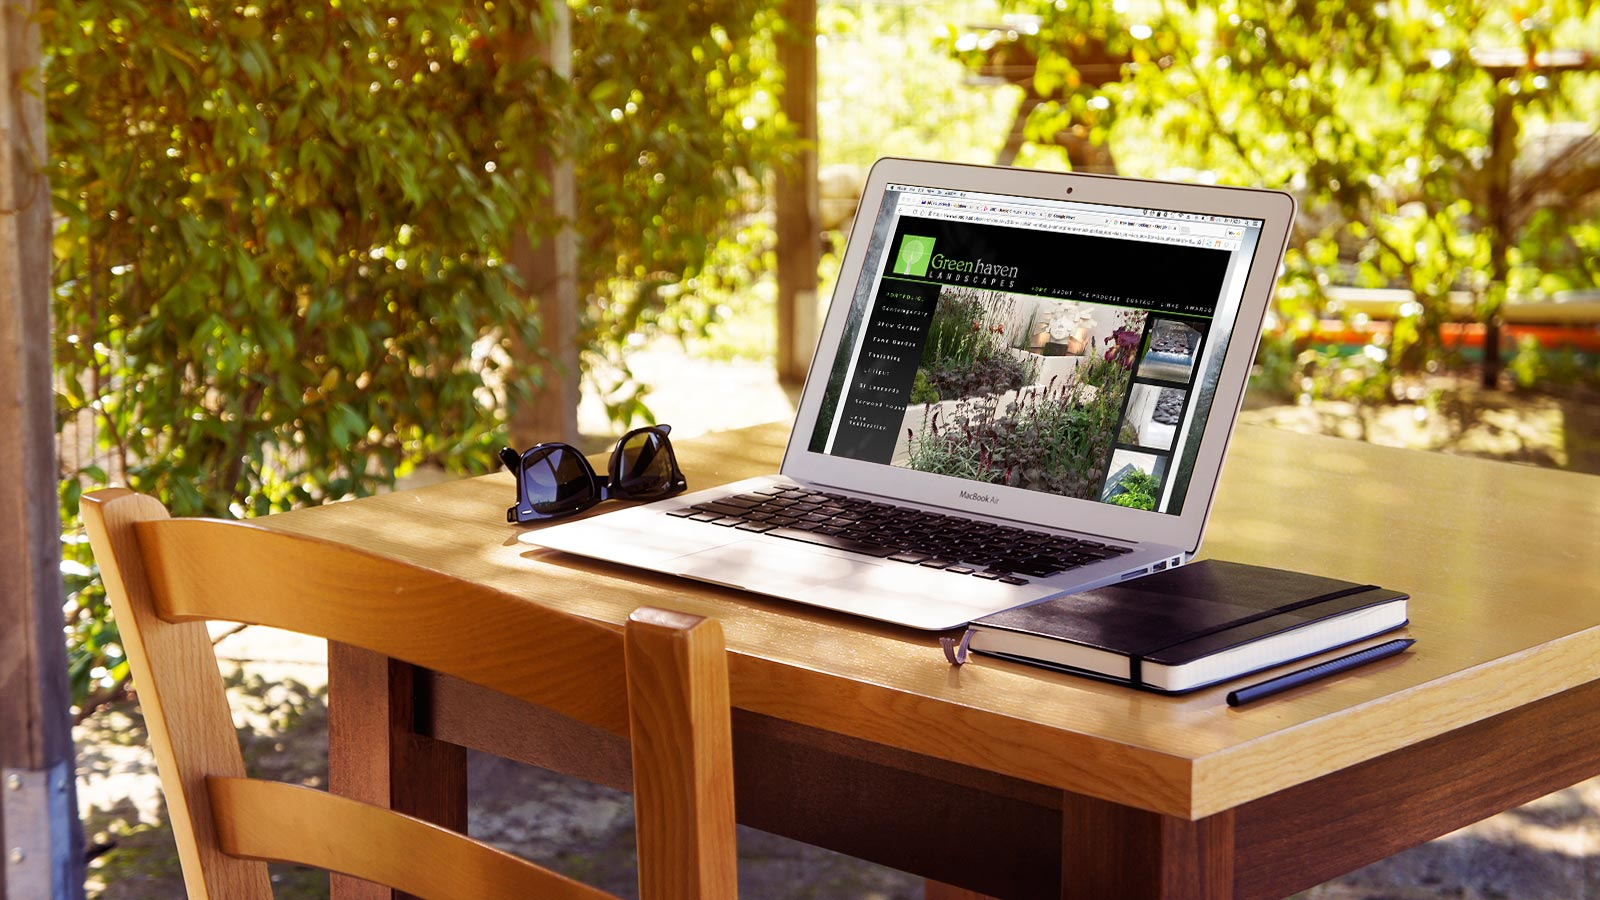 1200-Greenhaven-landscapes-website-MacBook-Air